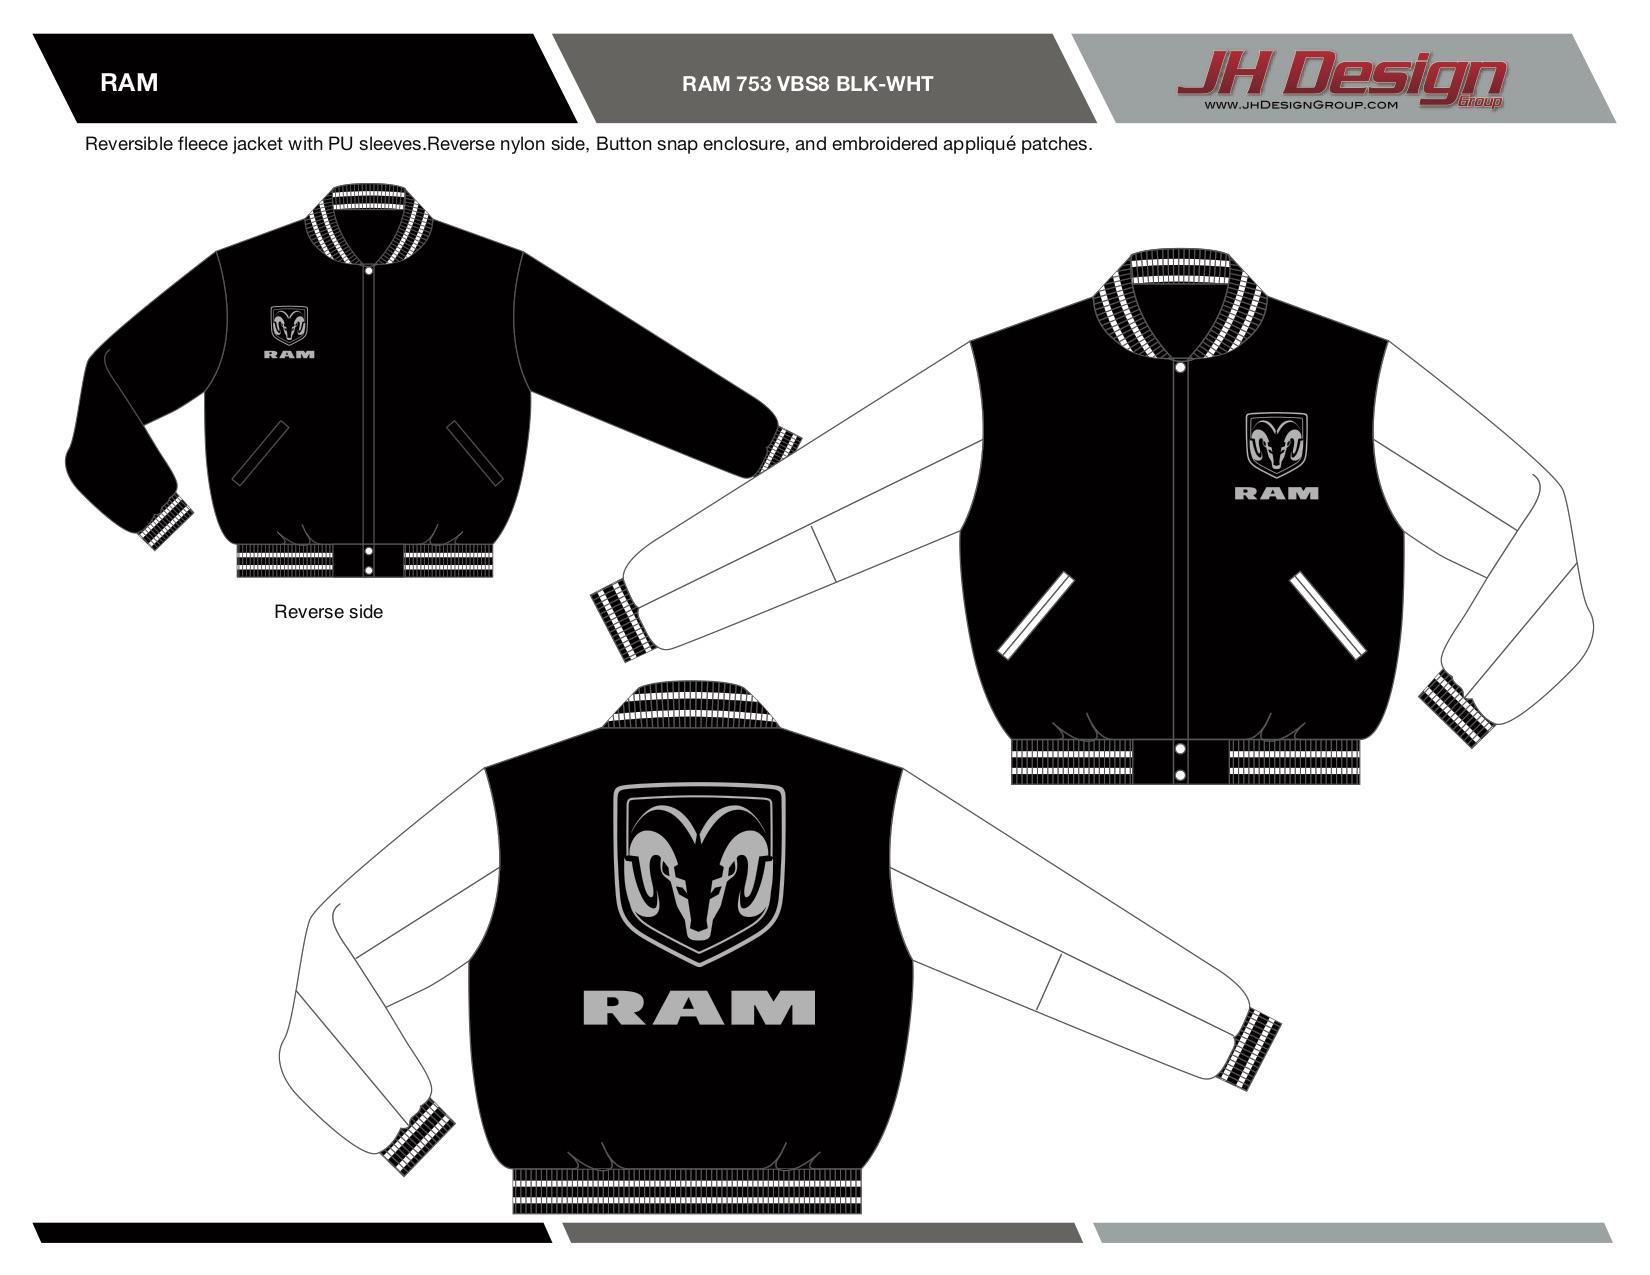 RAM 753 VBS8 BLK-WHT